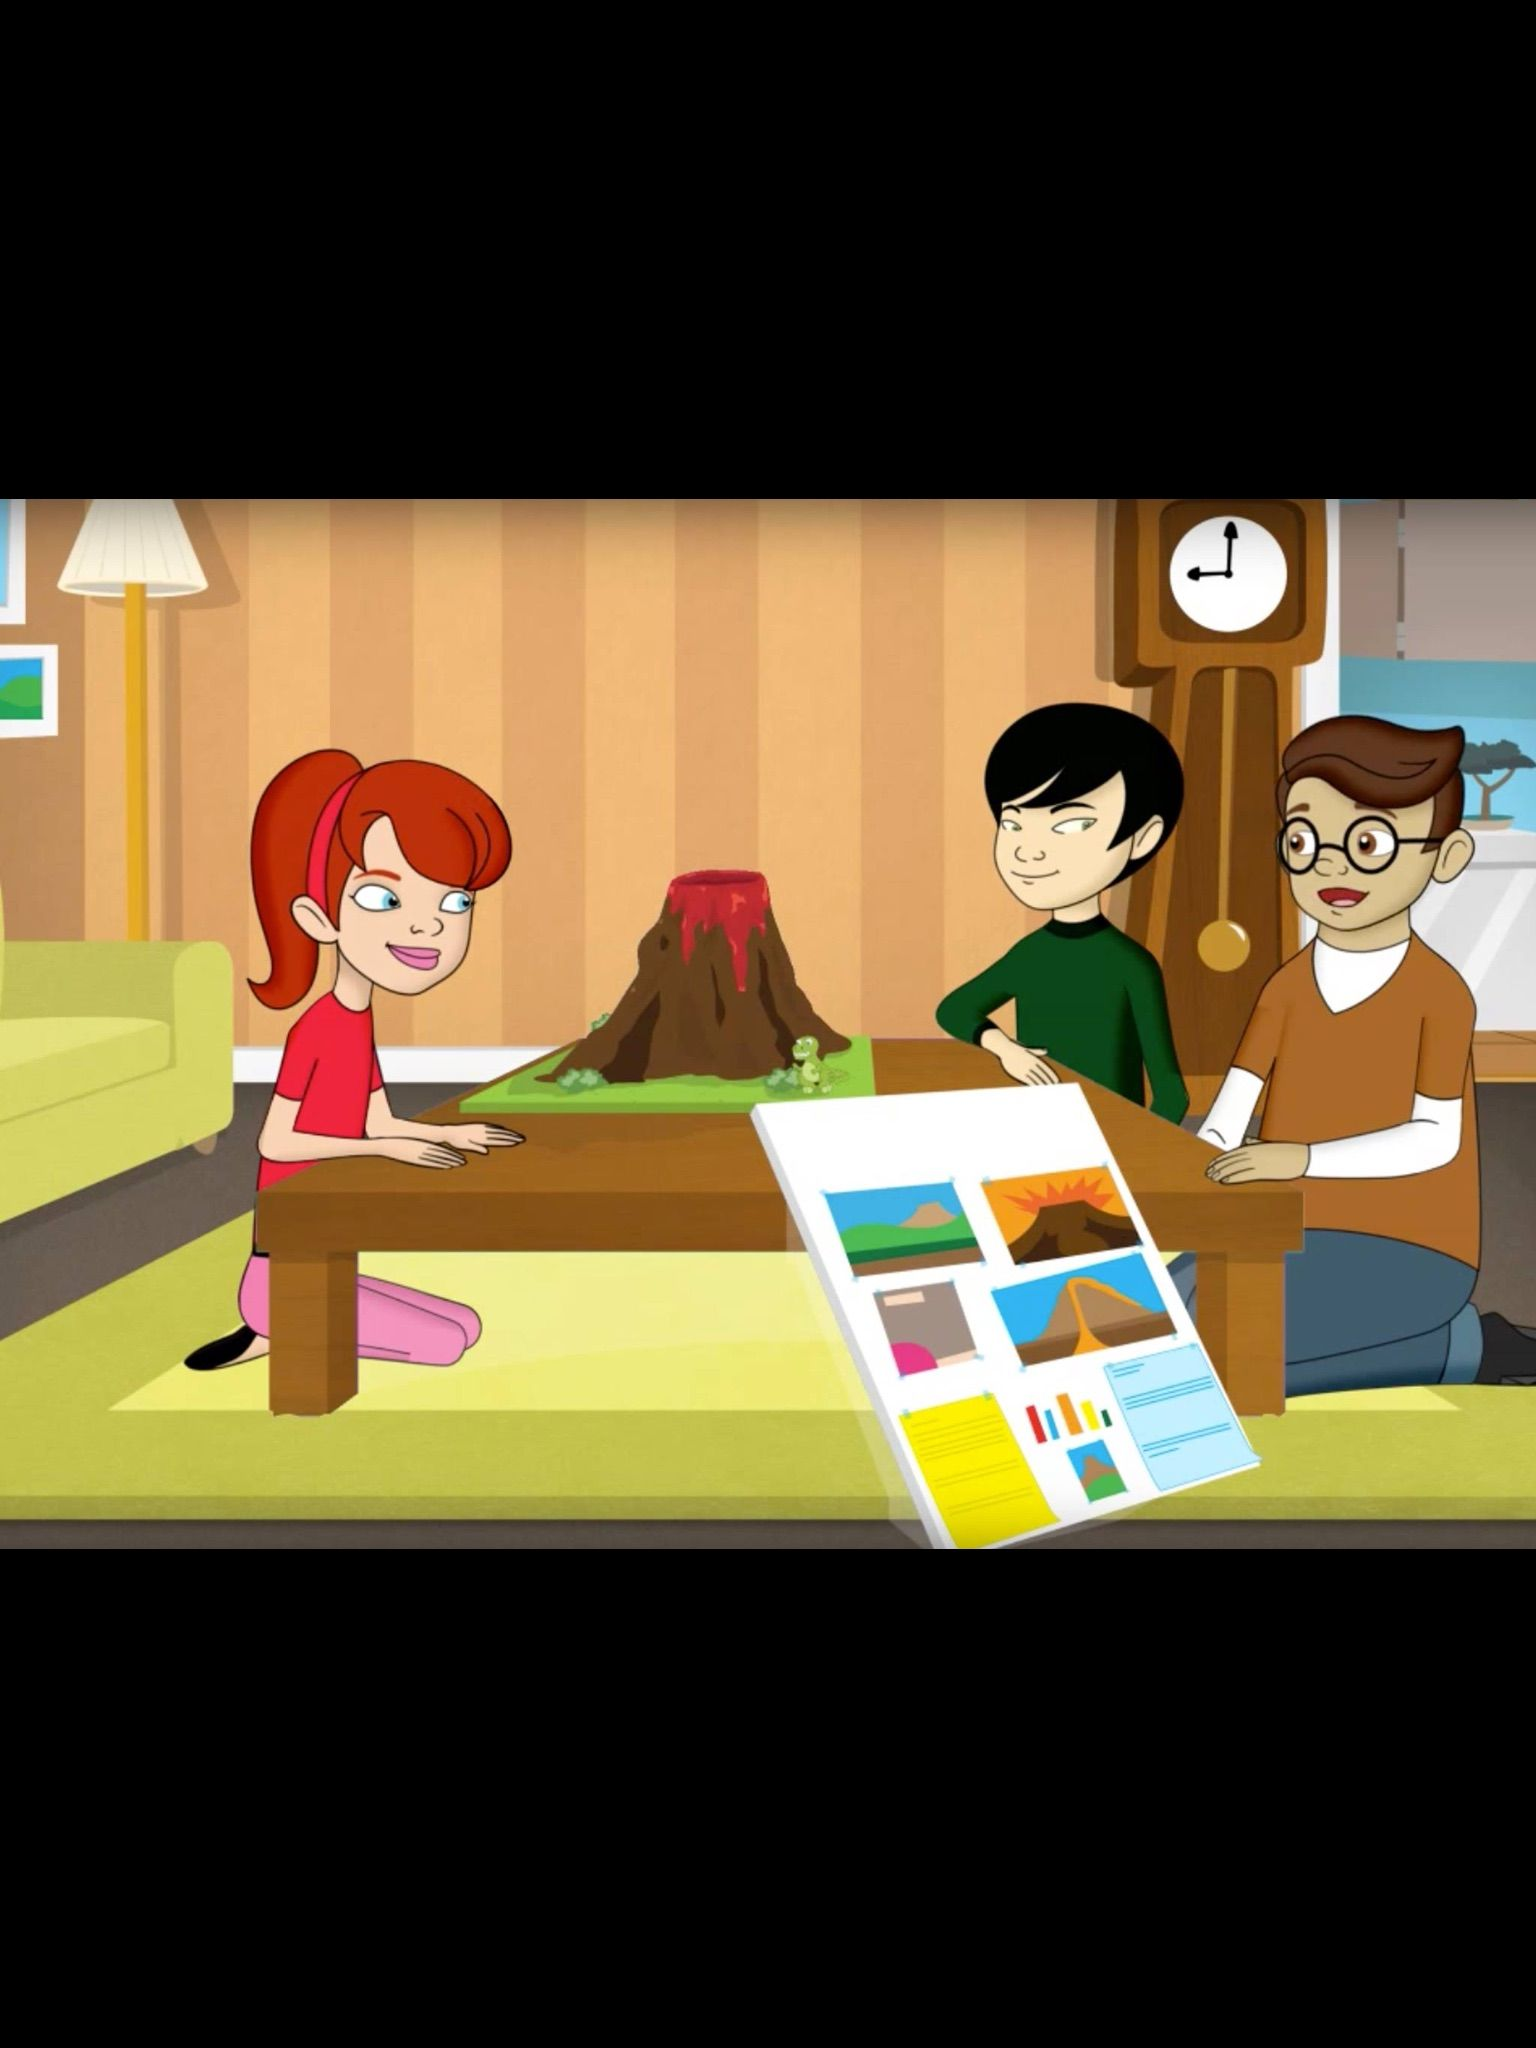 Pin On Middle School Social Skills